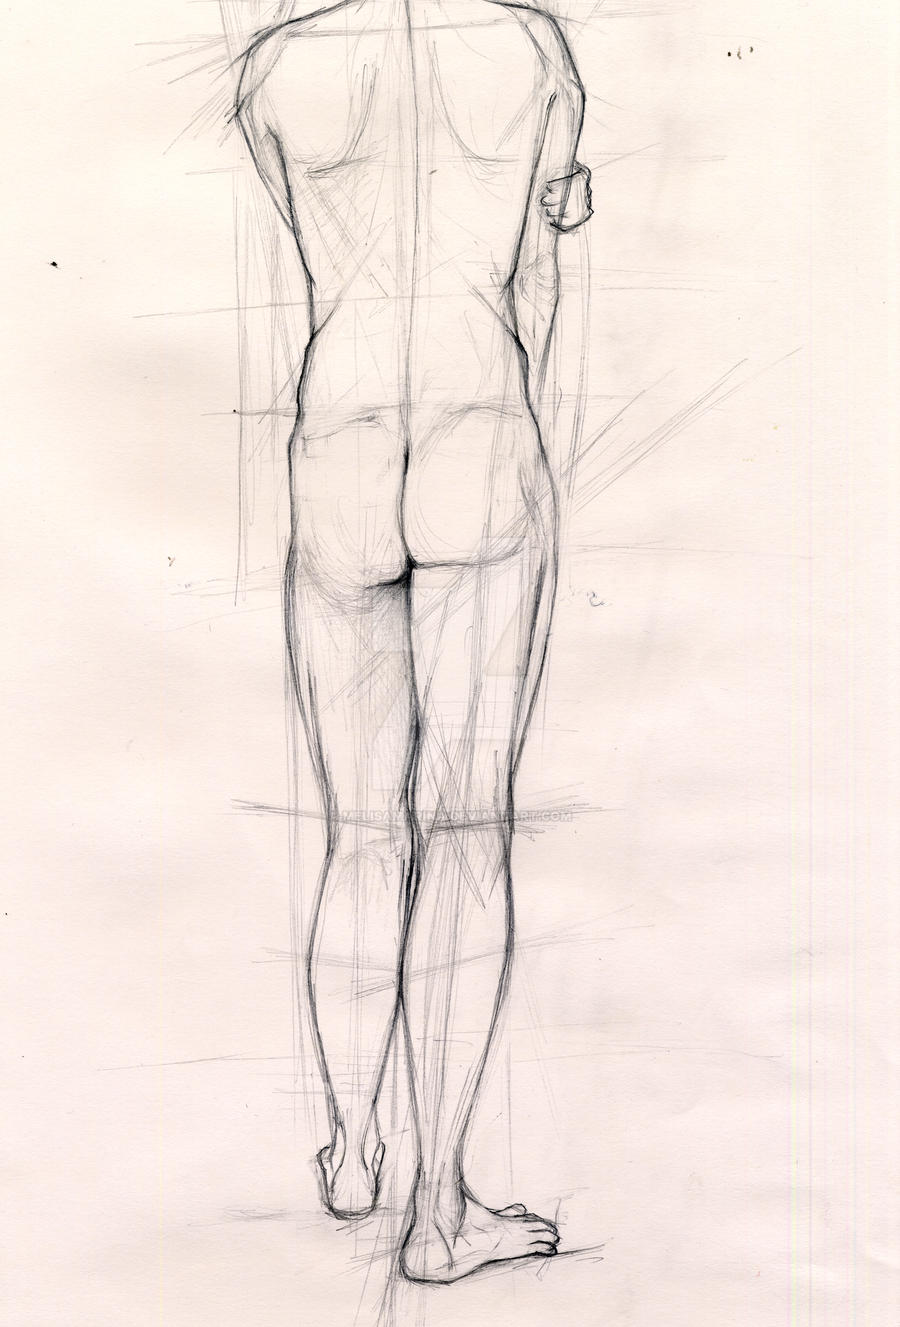 Life Drawing Human Body By Melisamarina On Deviantart